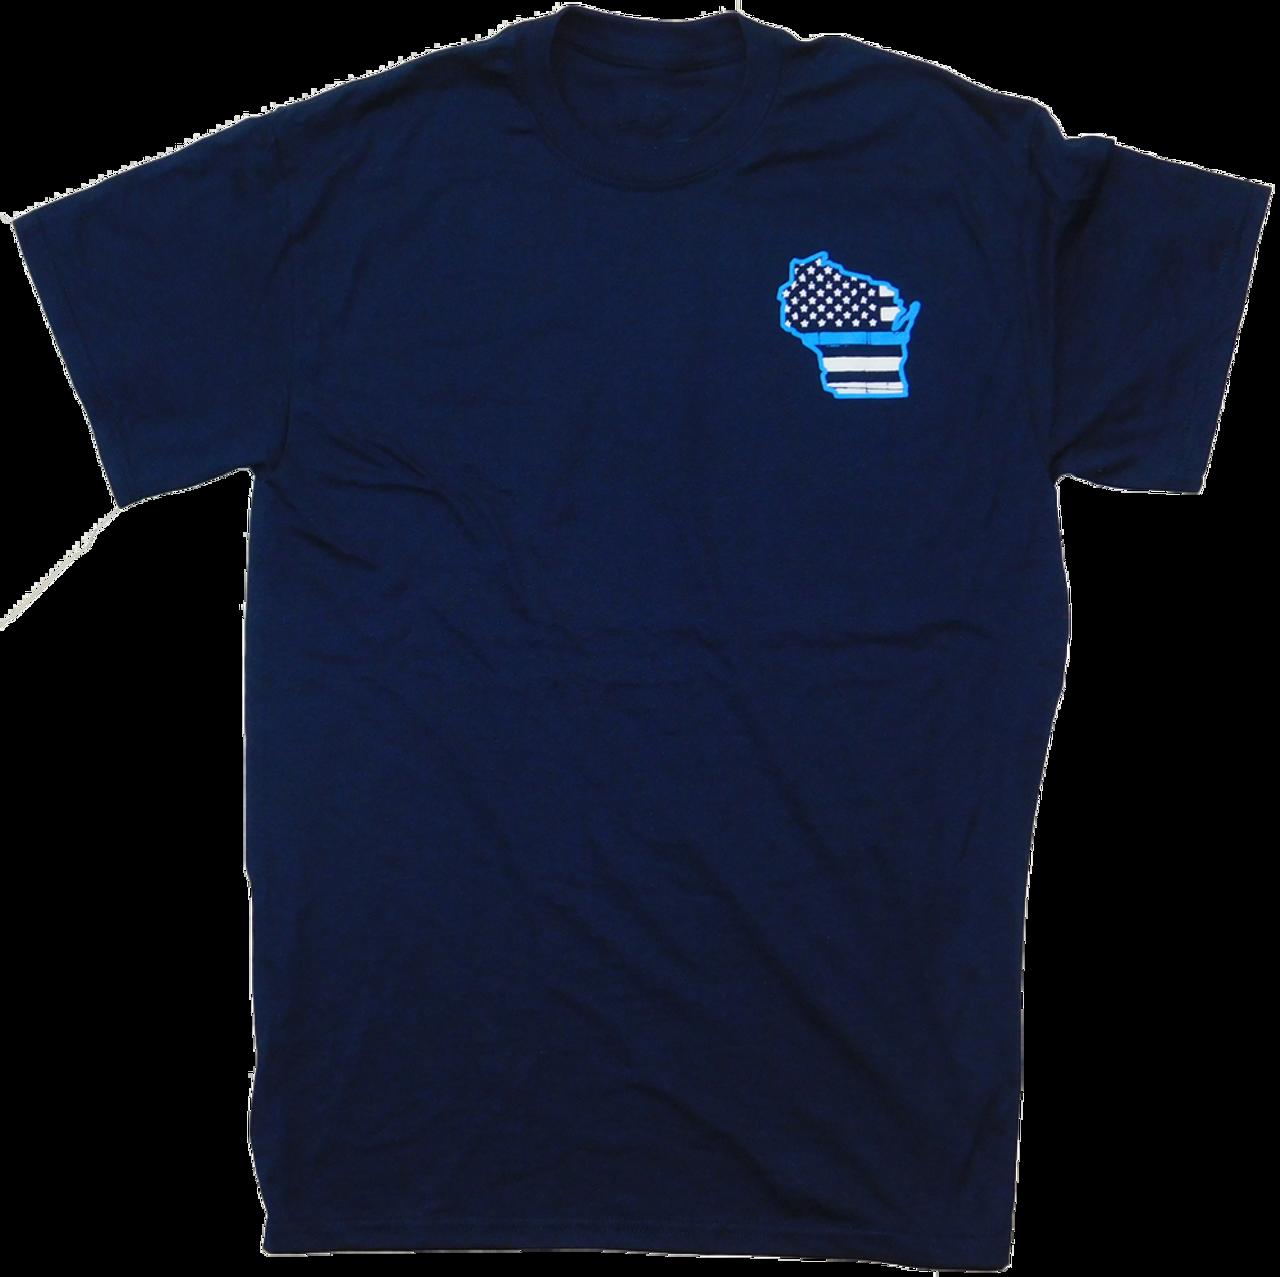 EMI-T-SS-Blue-Line: Navy Blue Wisconsin Blue Line Short Sleeve T by Eagle Media